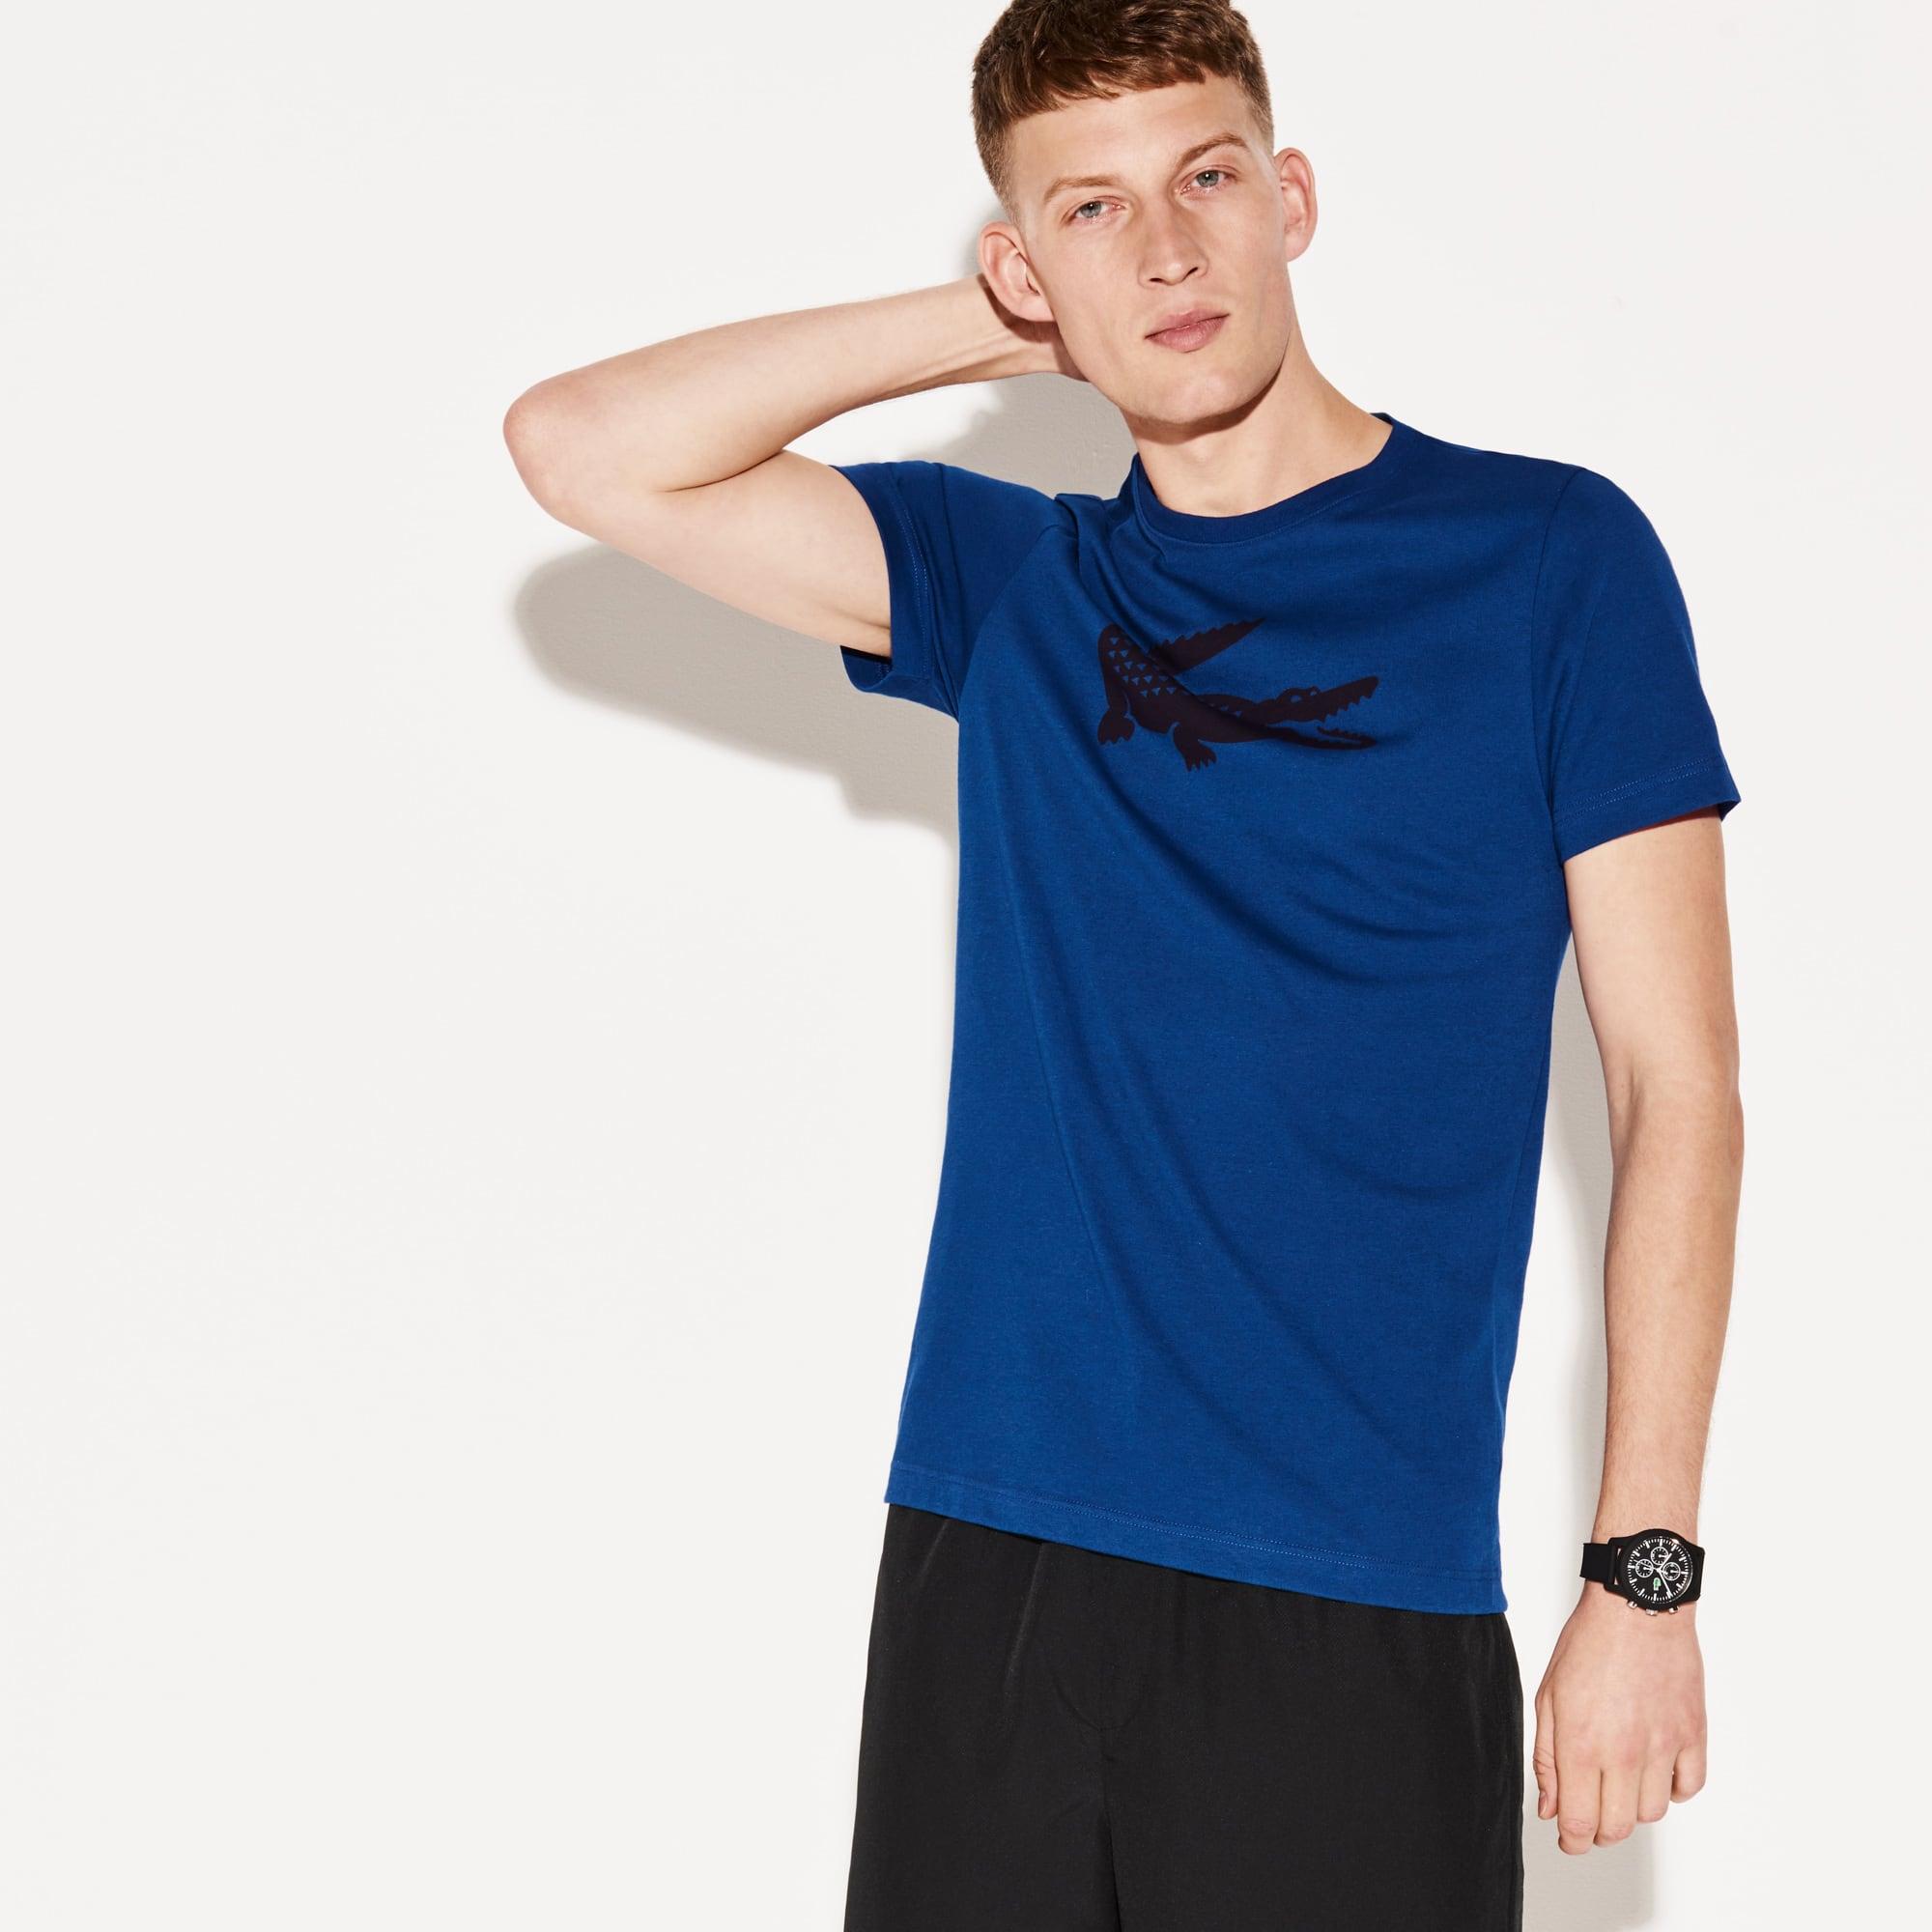 Camiseta Tenis Lacoste Sport De Punto Técnico Con Cocodrilo Oversized